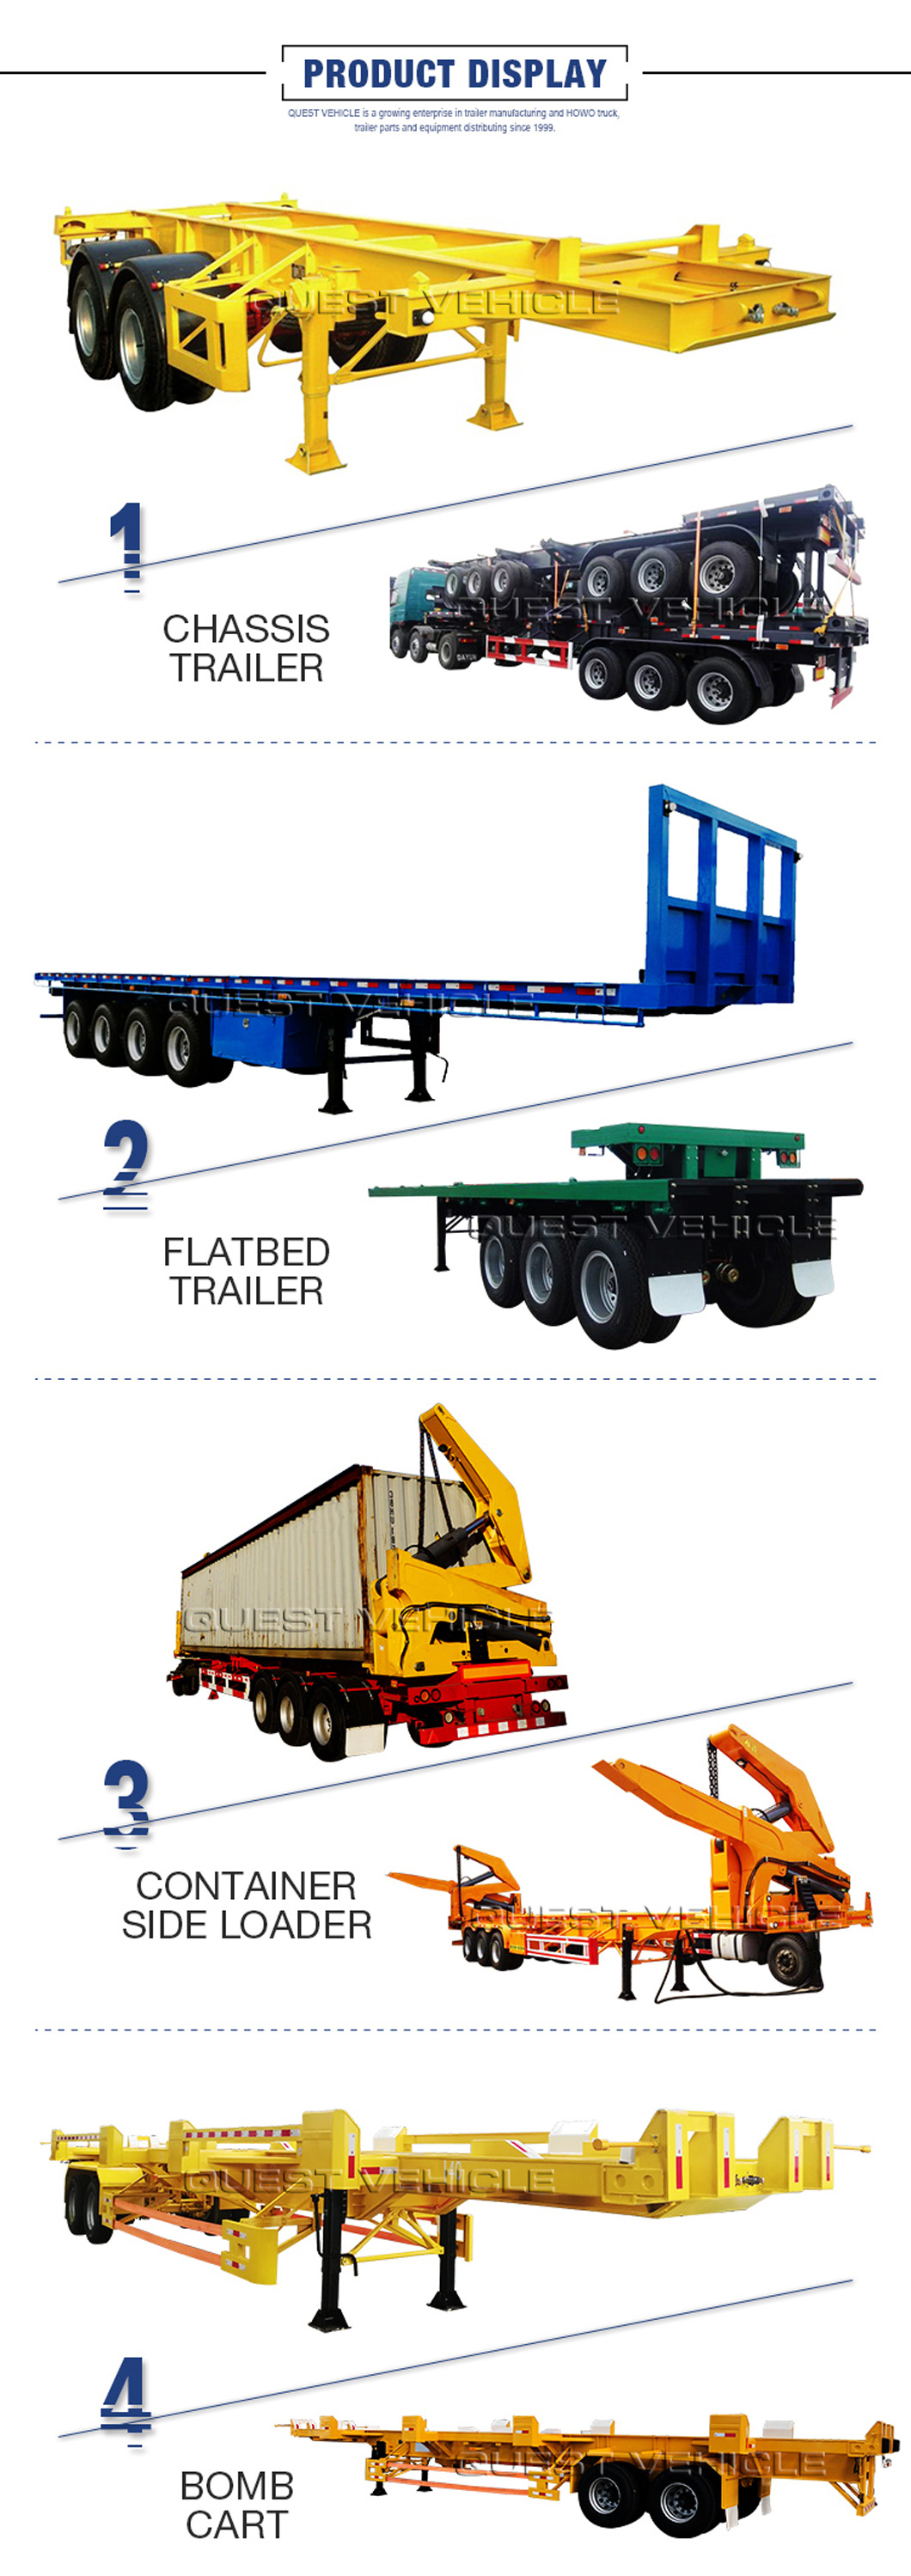 Quest Truck Trailer Manufacturers 40feet 3axles Flatbed Co<em></em>ntainer Semi Trailer